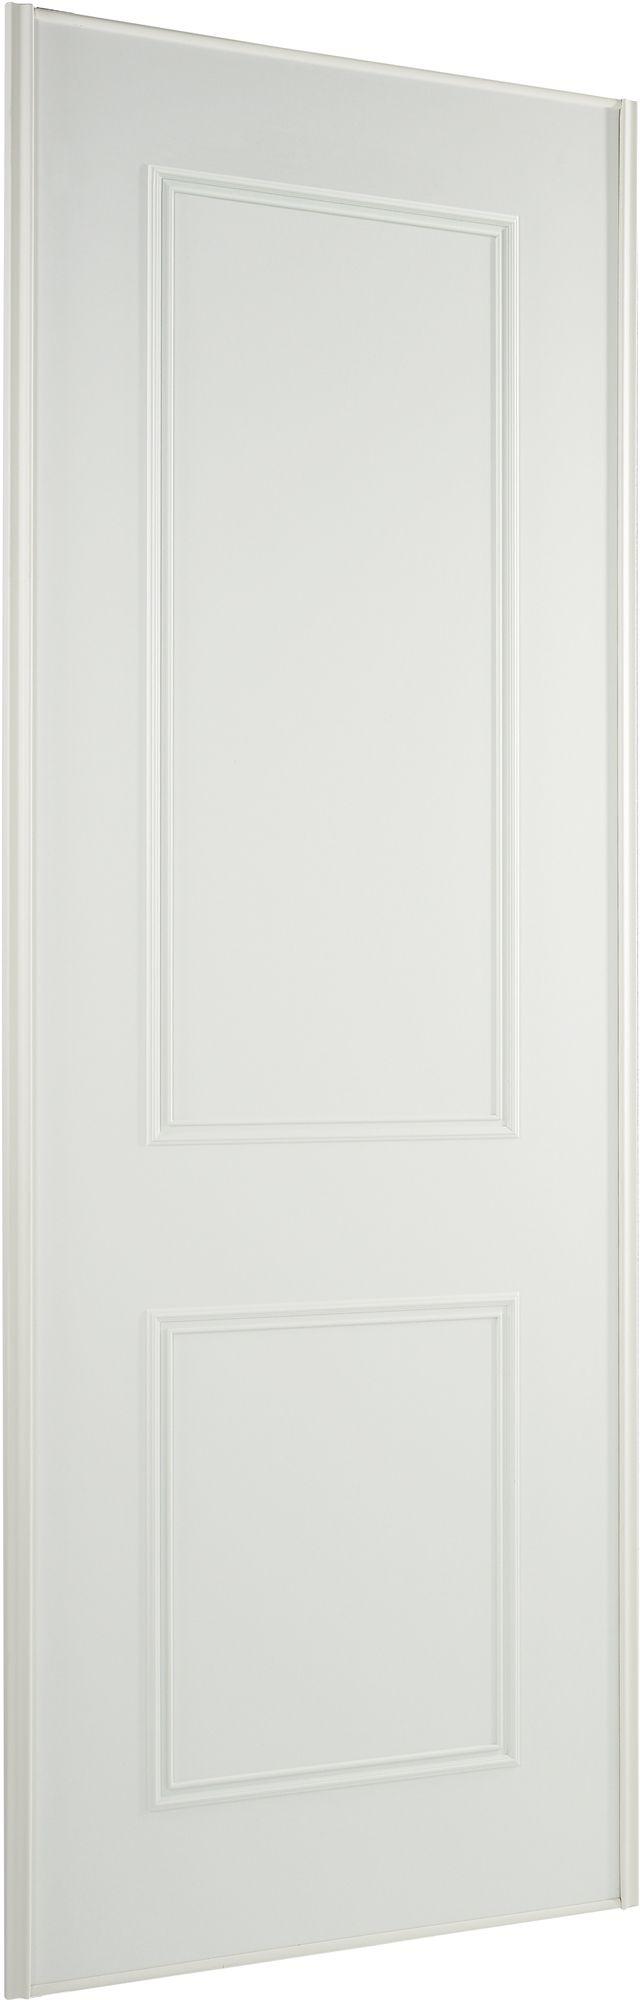 Panel White Wood Effect Sliding Wardrobe Door (H)2220 mm (W)914 mm